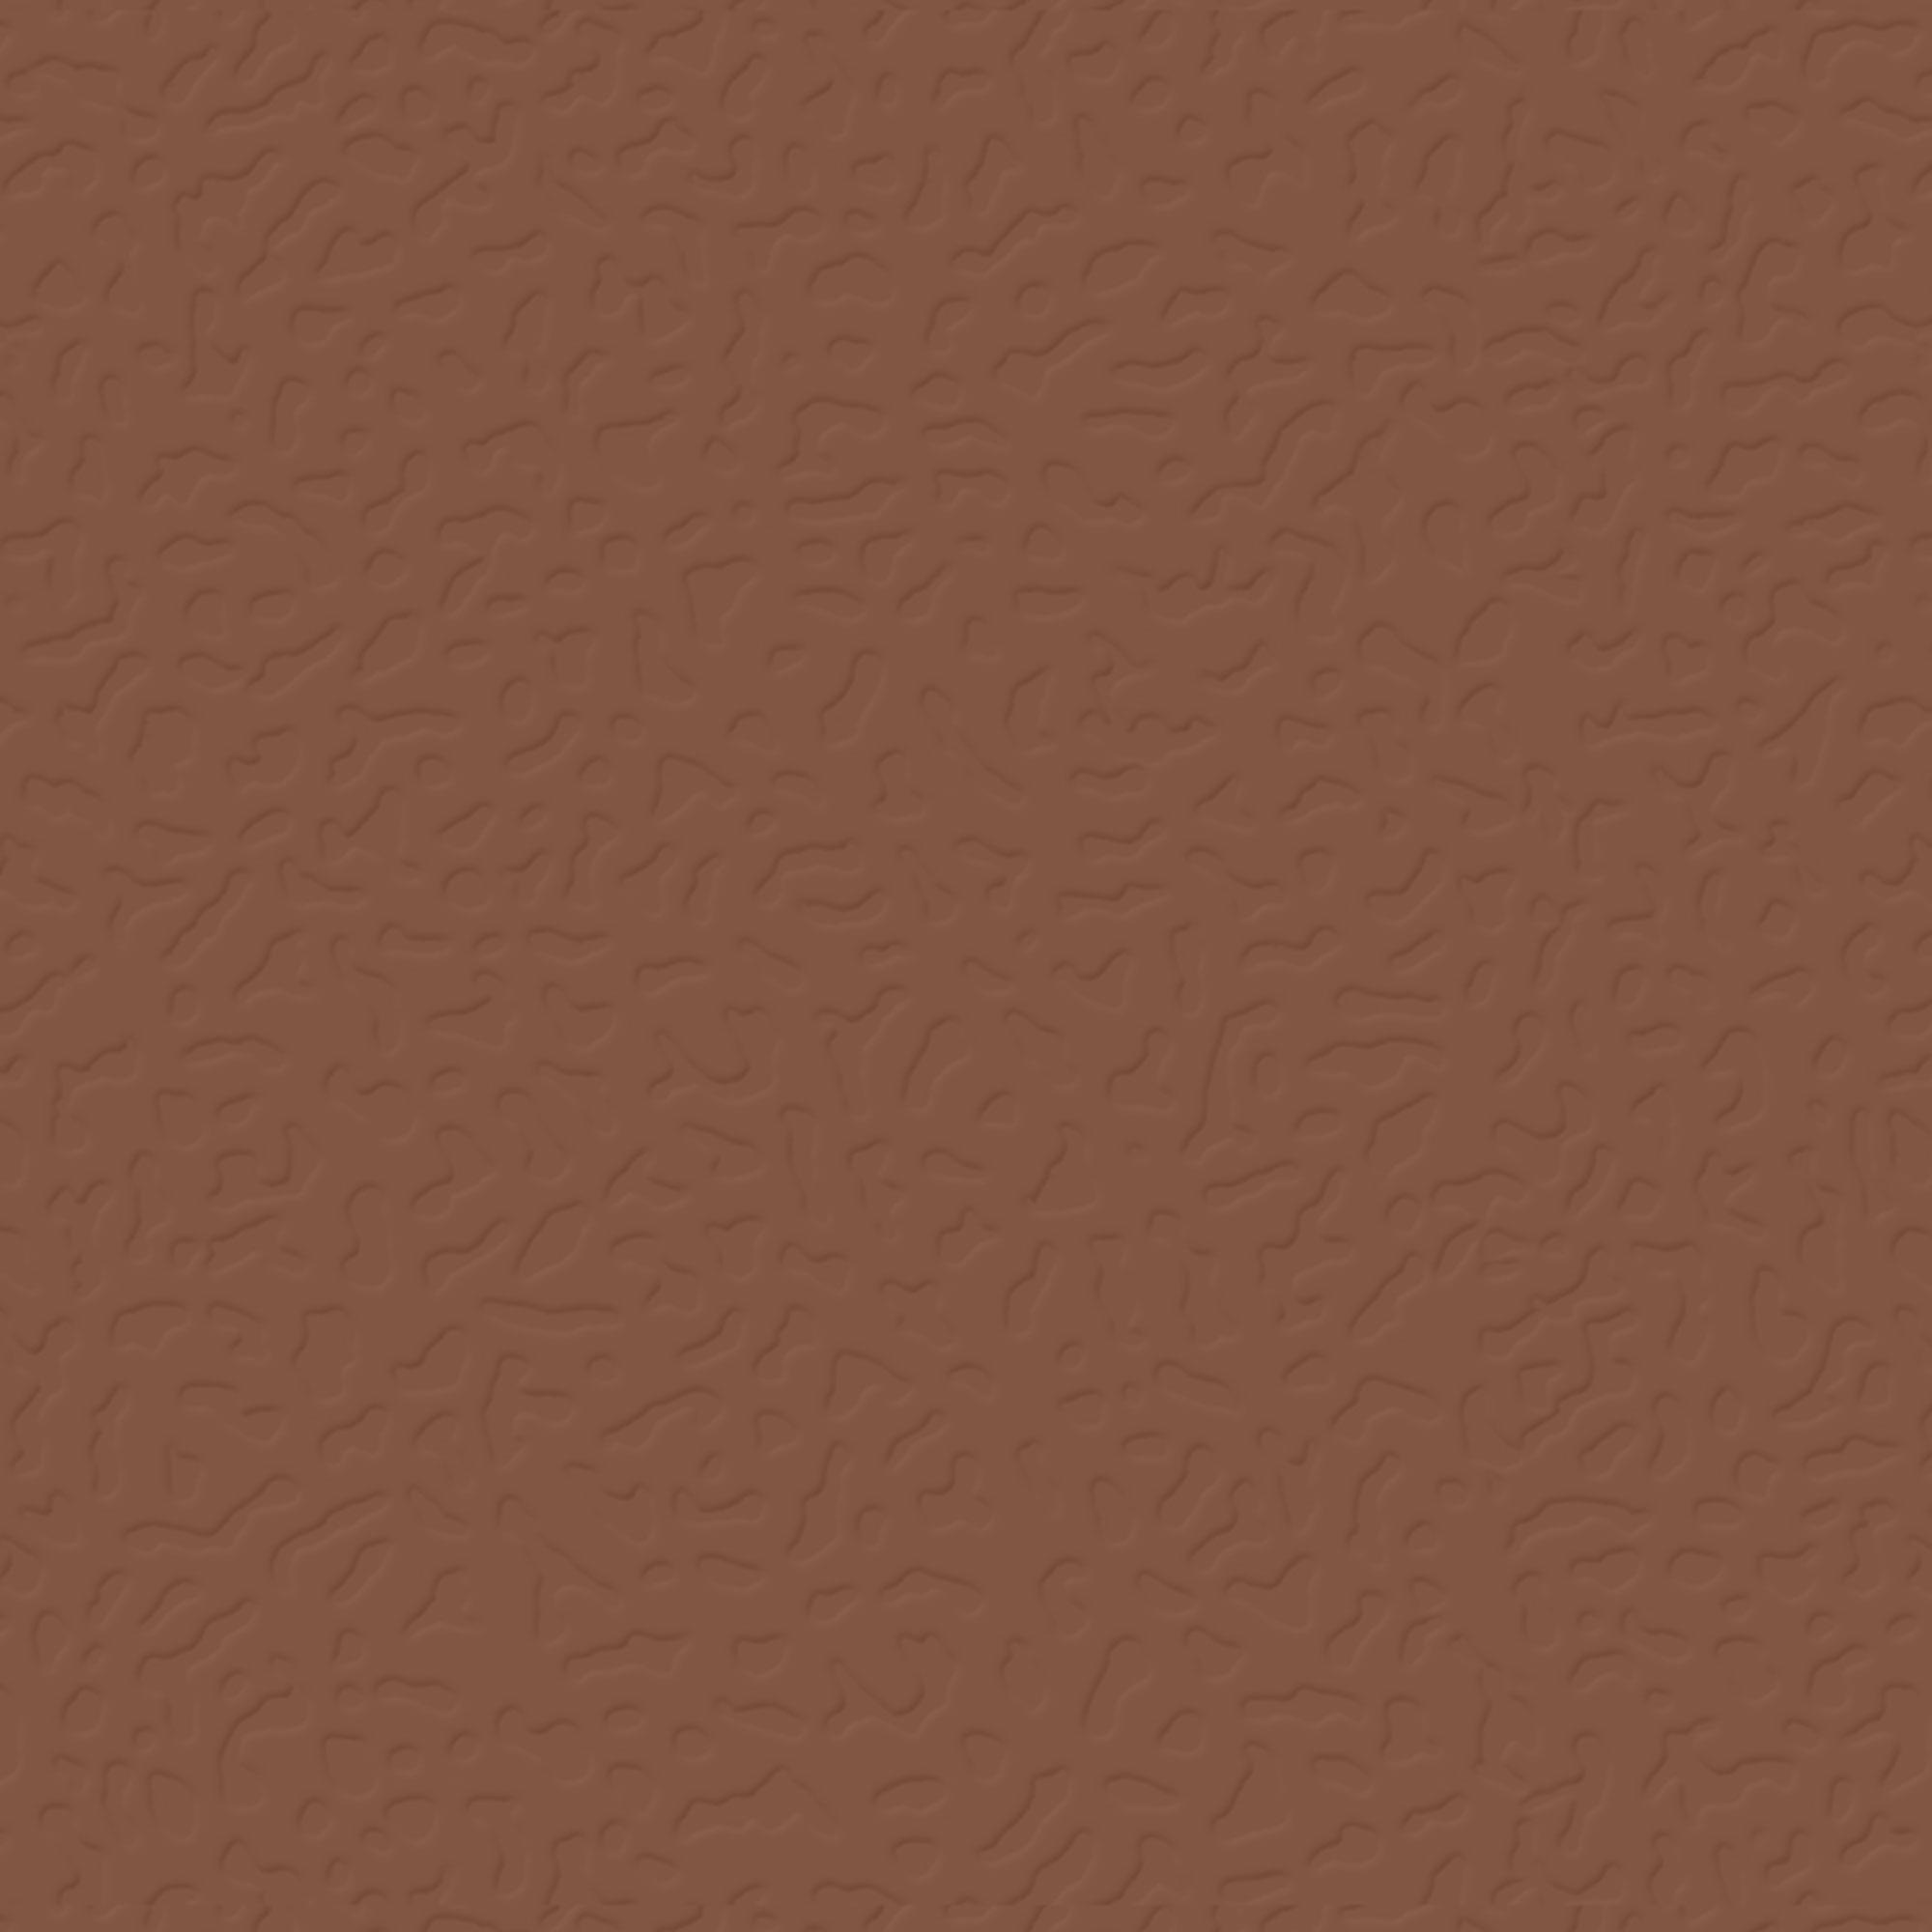 Roppe Rubber Tile 900 - Hammered Design (995) Nutmeg Rubber Flooring